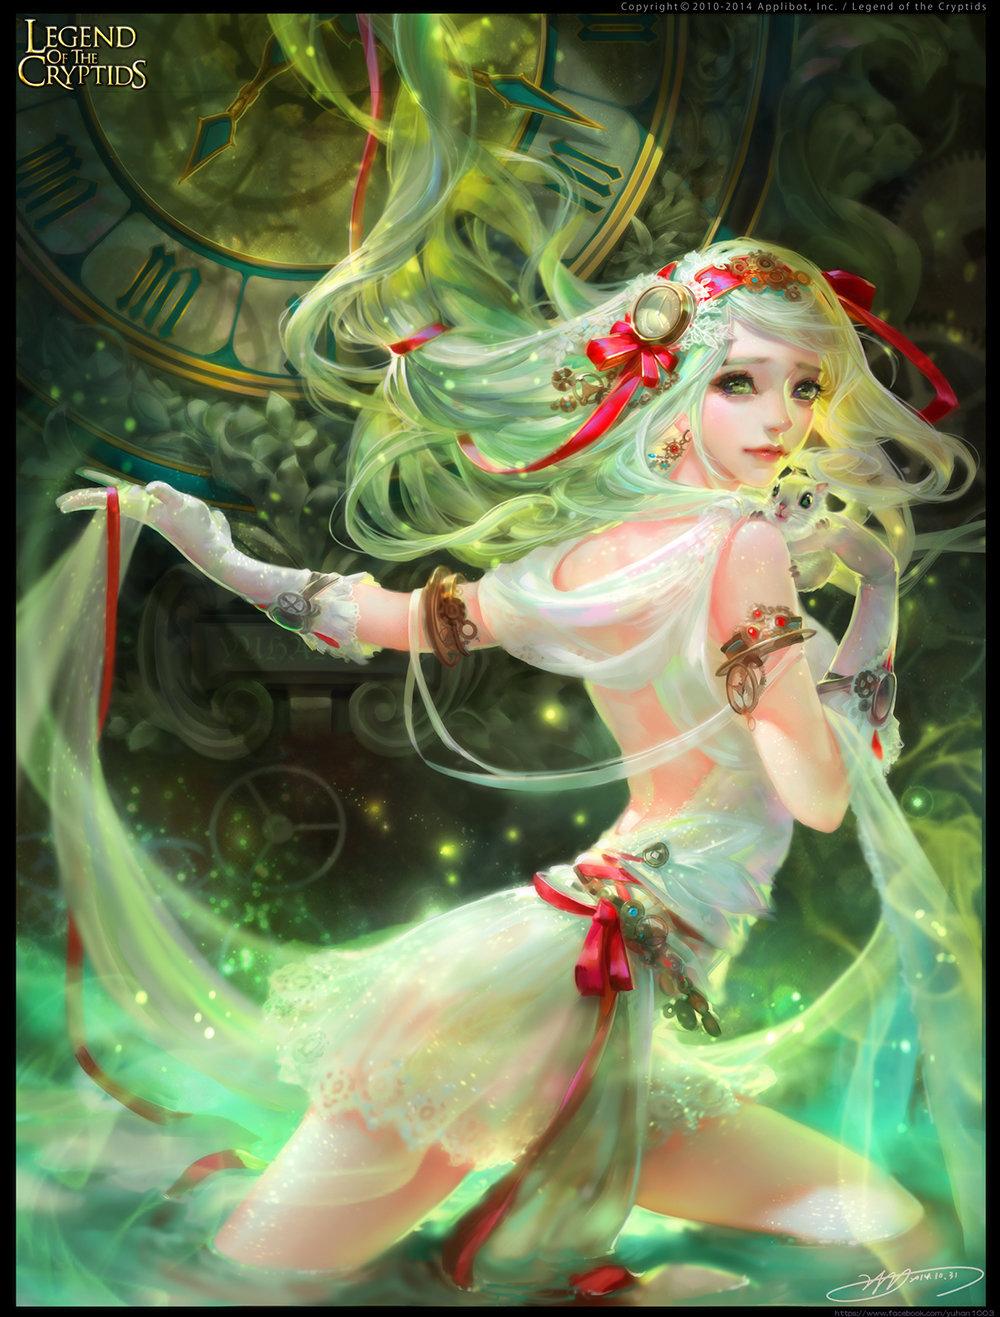 Les pin-ups sexy en digital painting de Yu-Han Chen